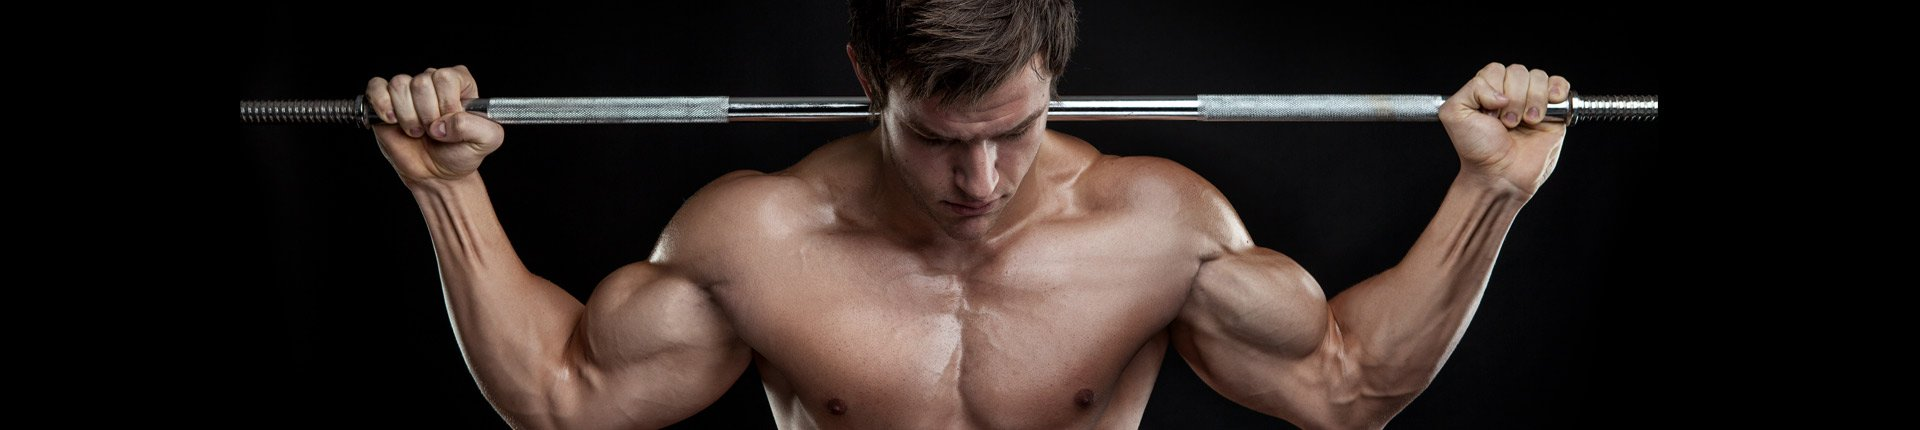 Trening 3 dniowy na masę - plan treningowy